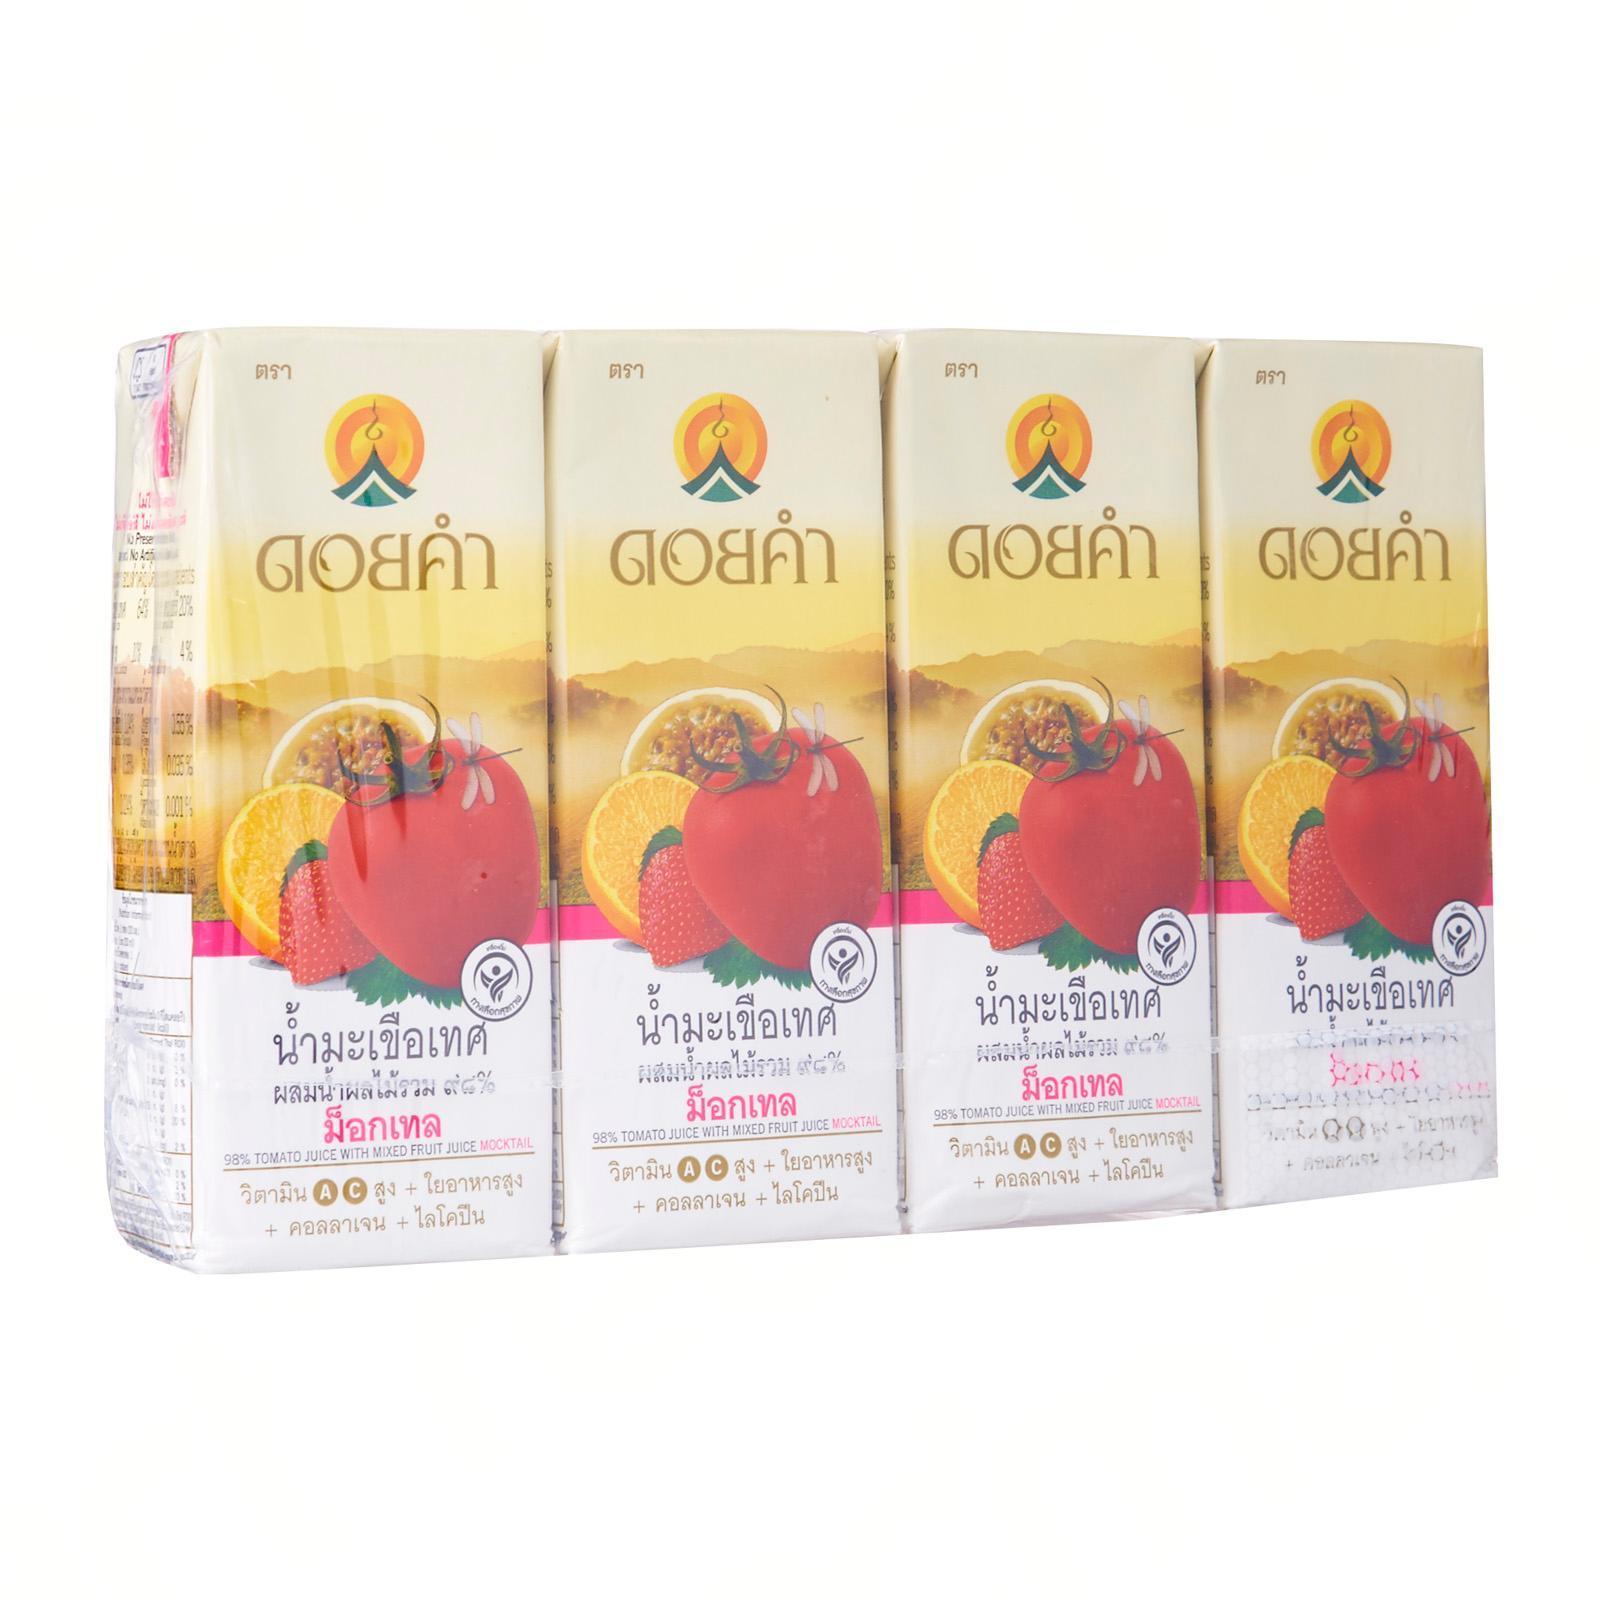 Doi Kham 98% Tomato Juice With Mixed Fruit Juice Mocktail (Tomato Strawberry Passion Fruit Orange) Not From Concentrate